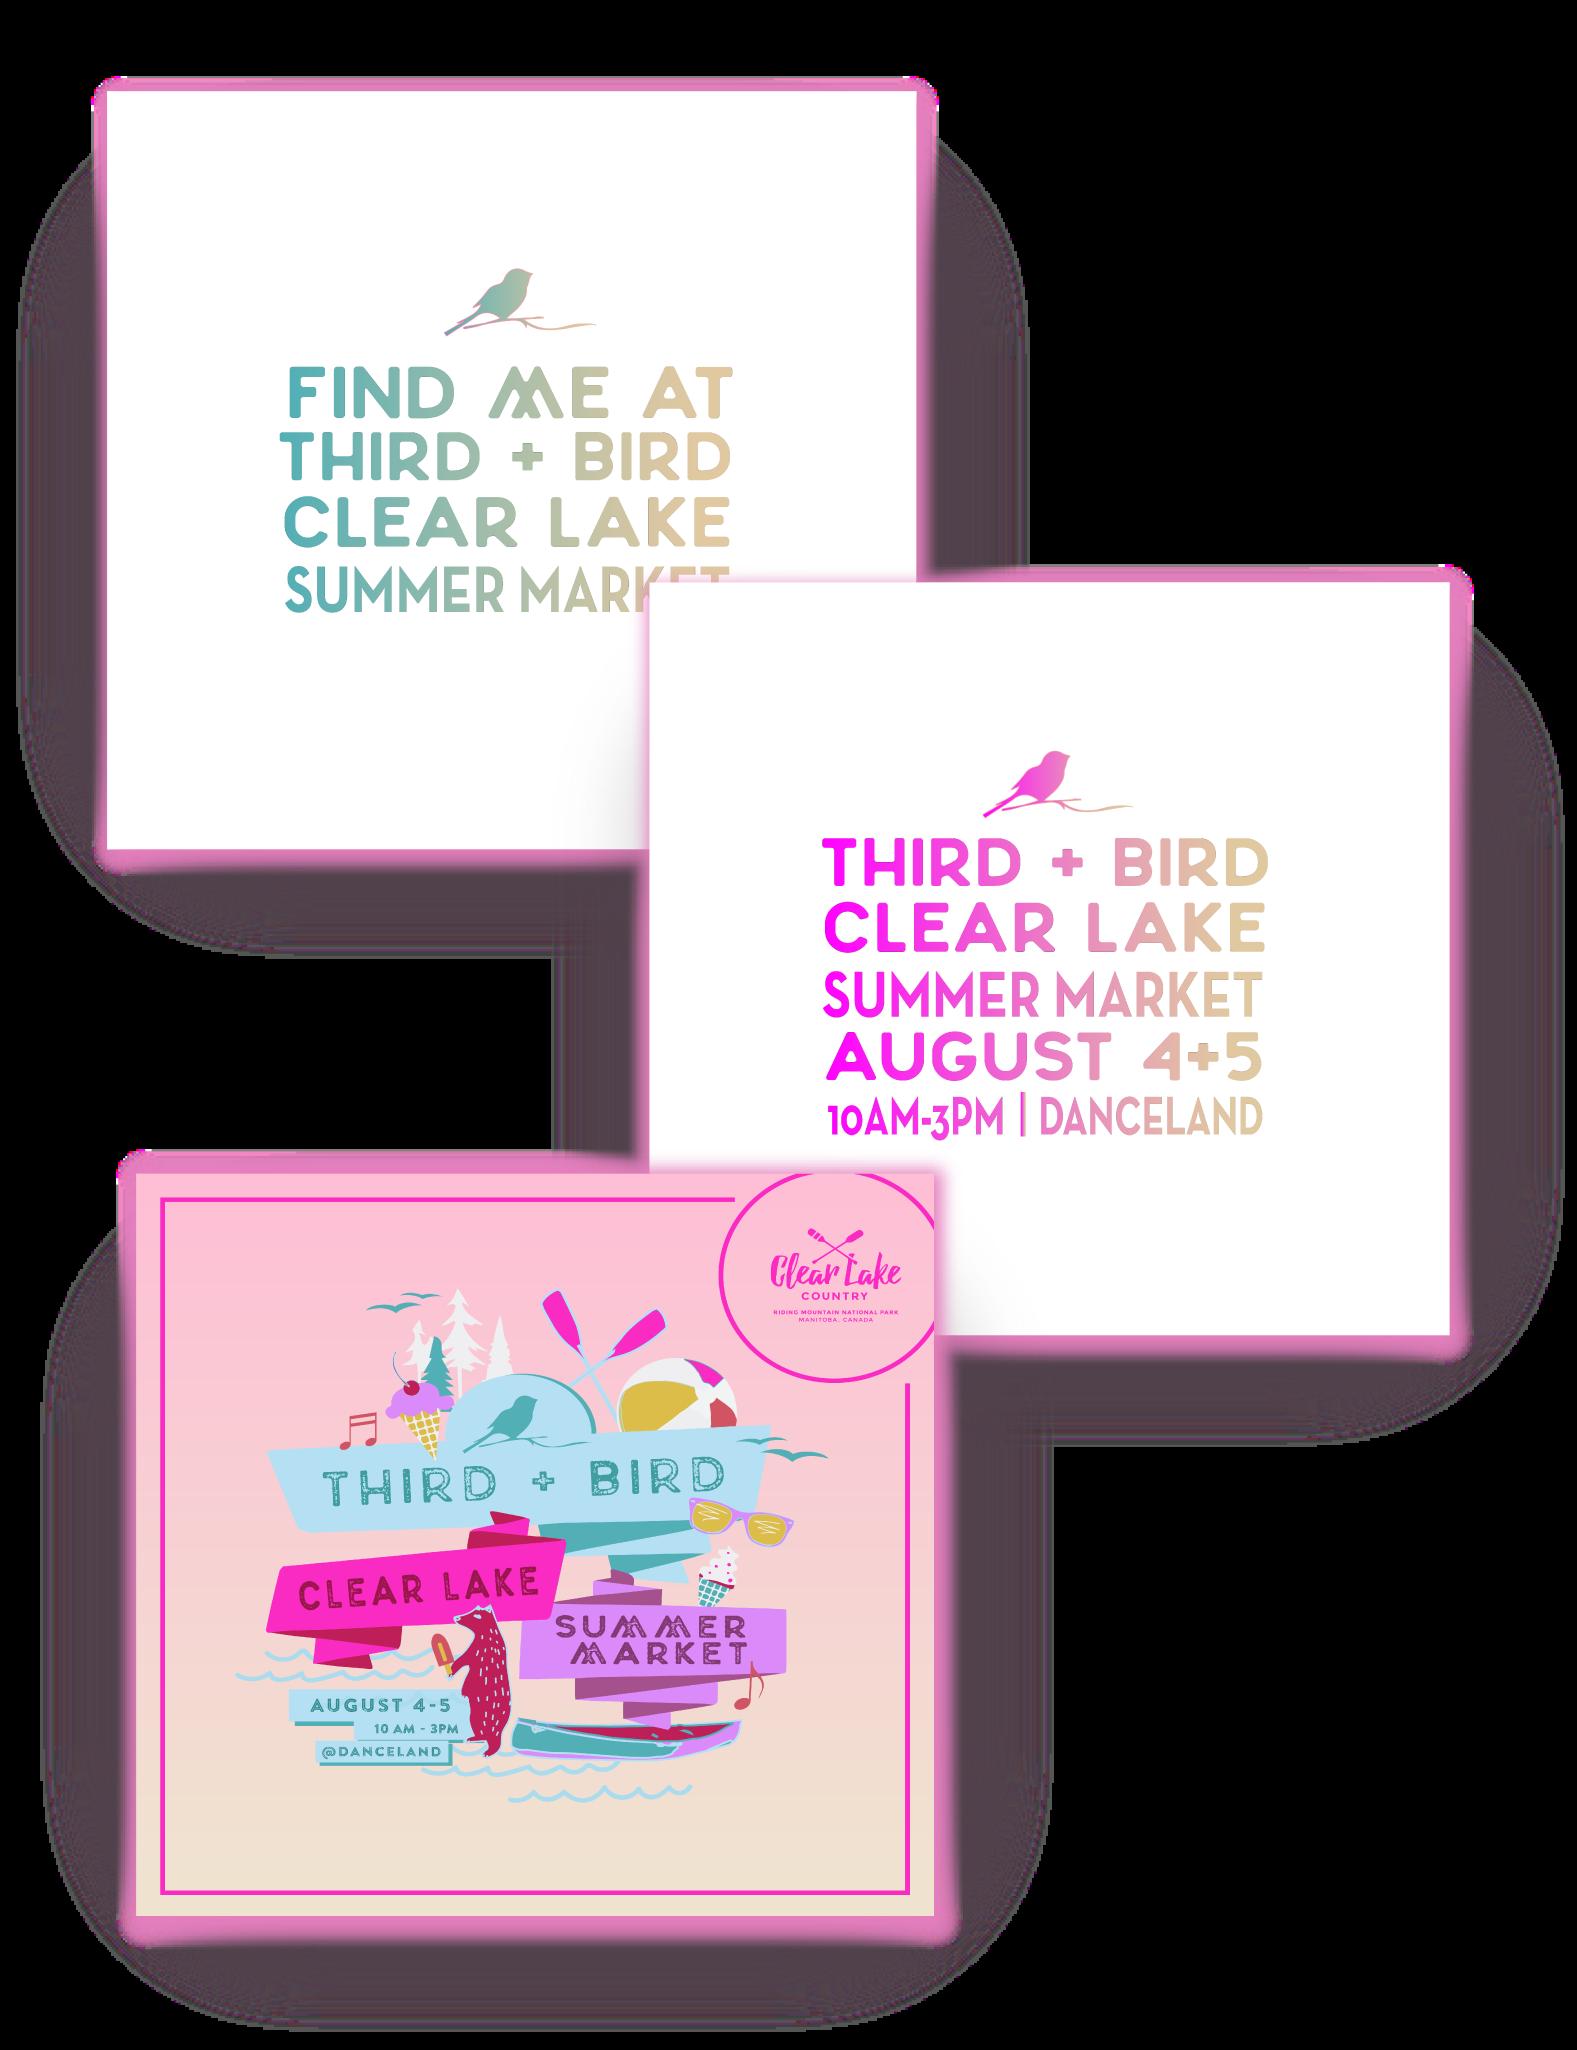 Third + Bird Clear Lake Event Brand